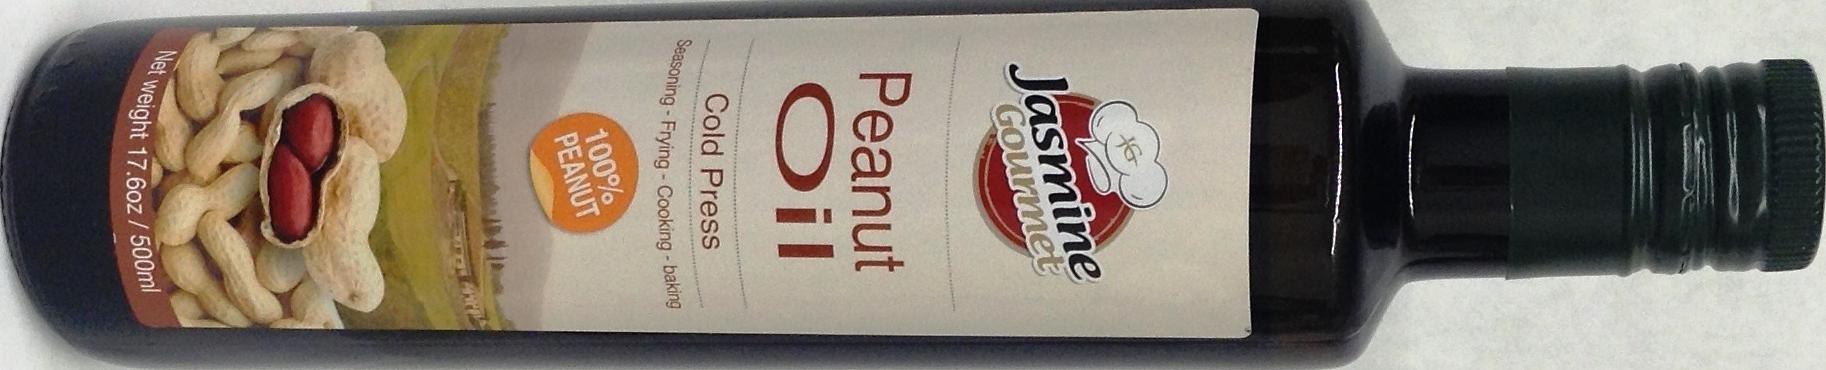 Jasmine Gourmet 100% Peanut Oil Cold Press KFP 17.6 Oz. Pack Of 6.